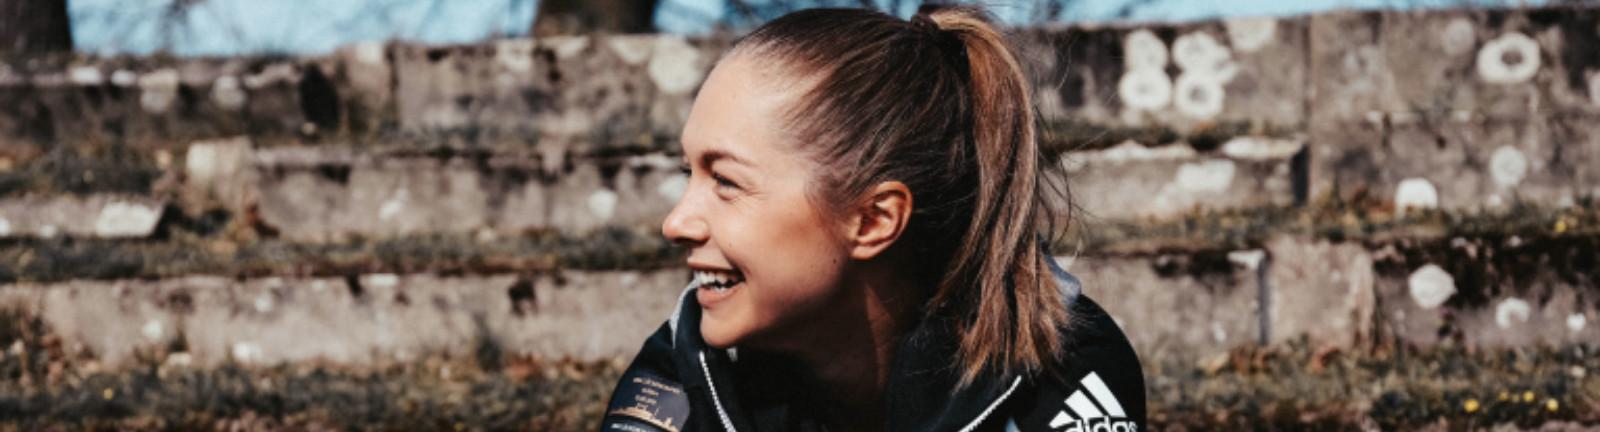 Sprinterin Gina Lückenkemper